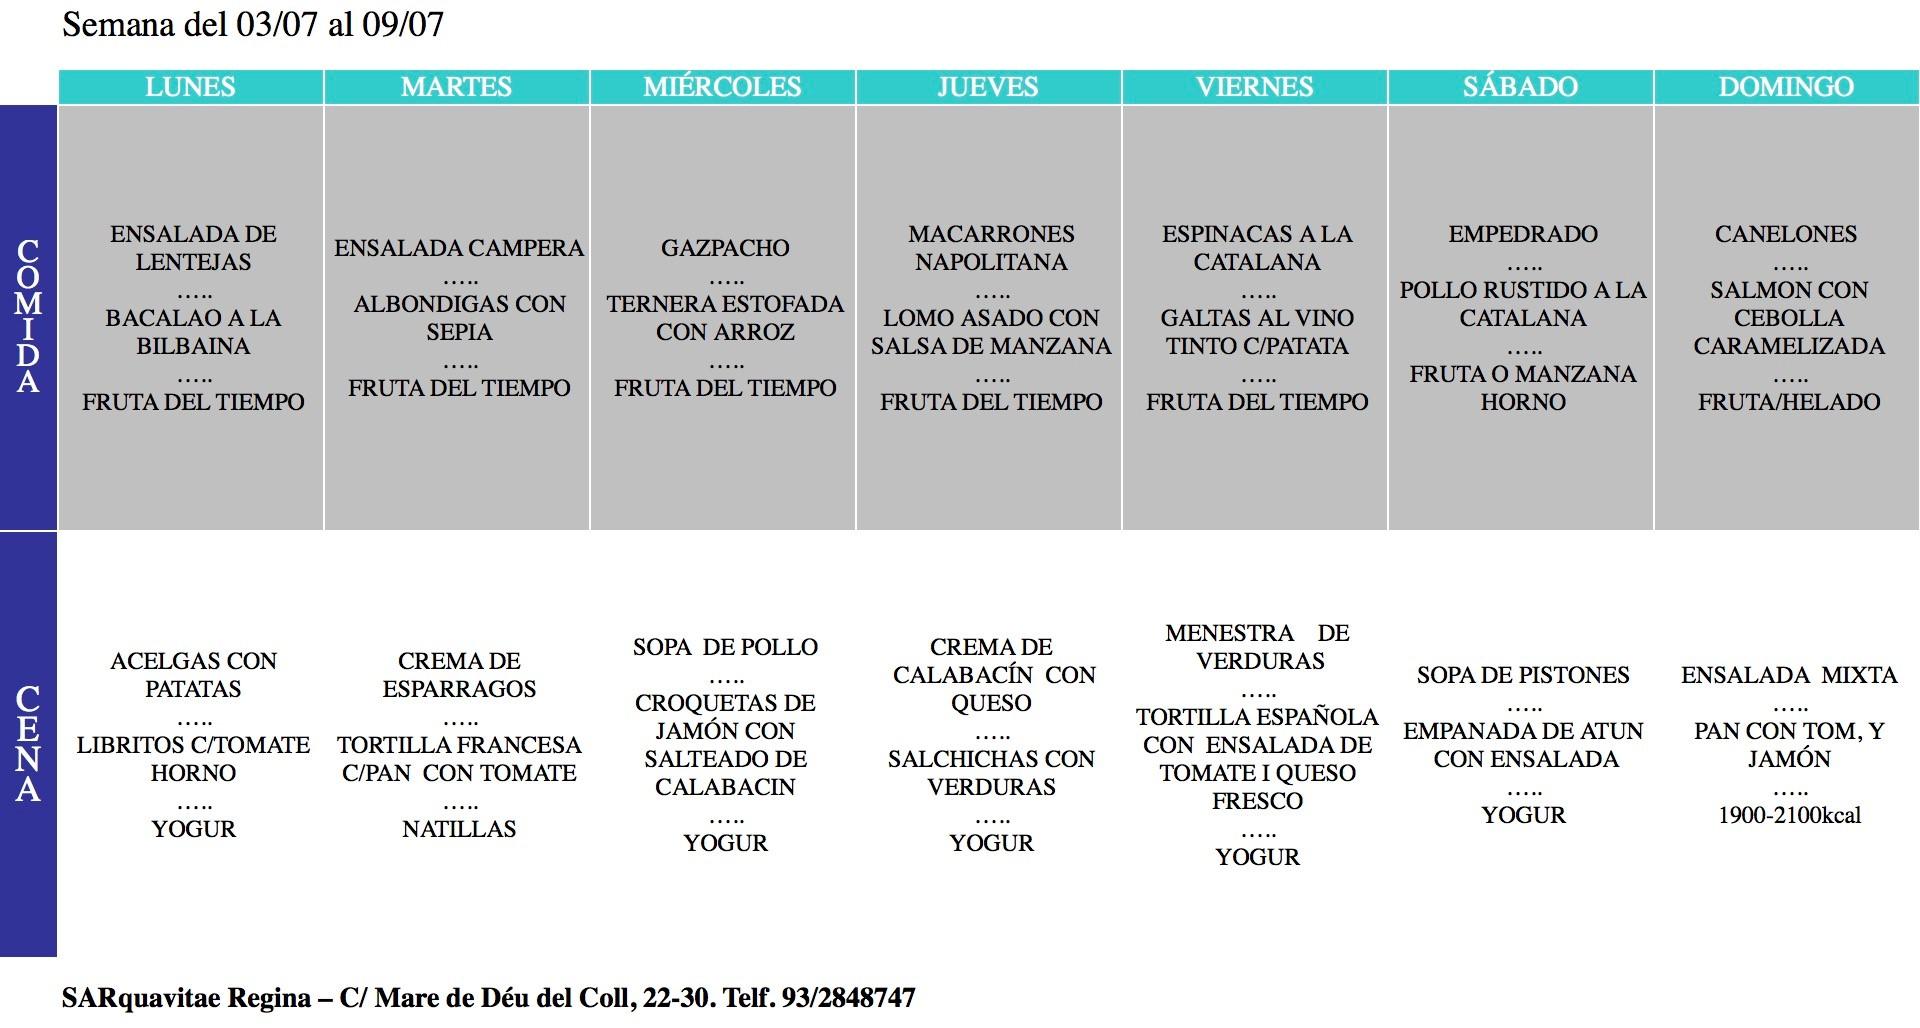 Semana 2 Julio